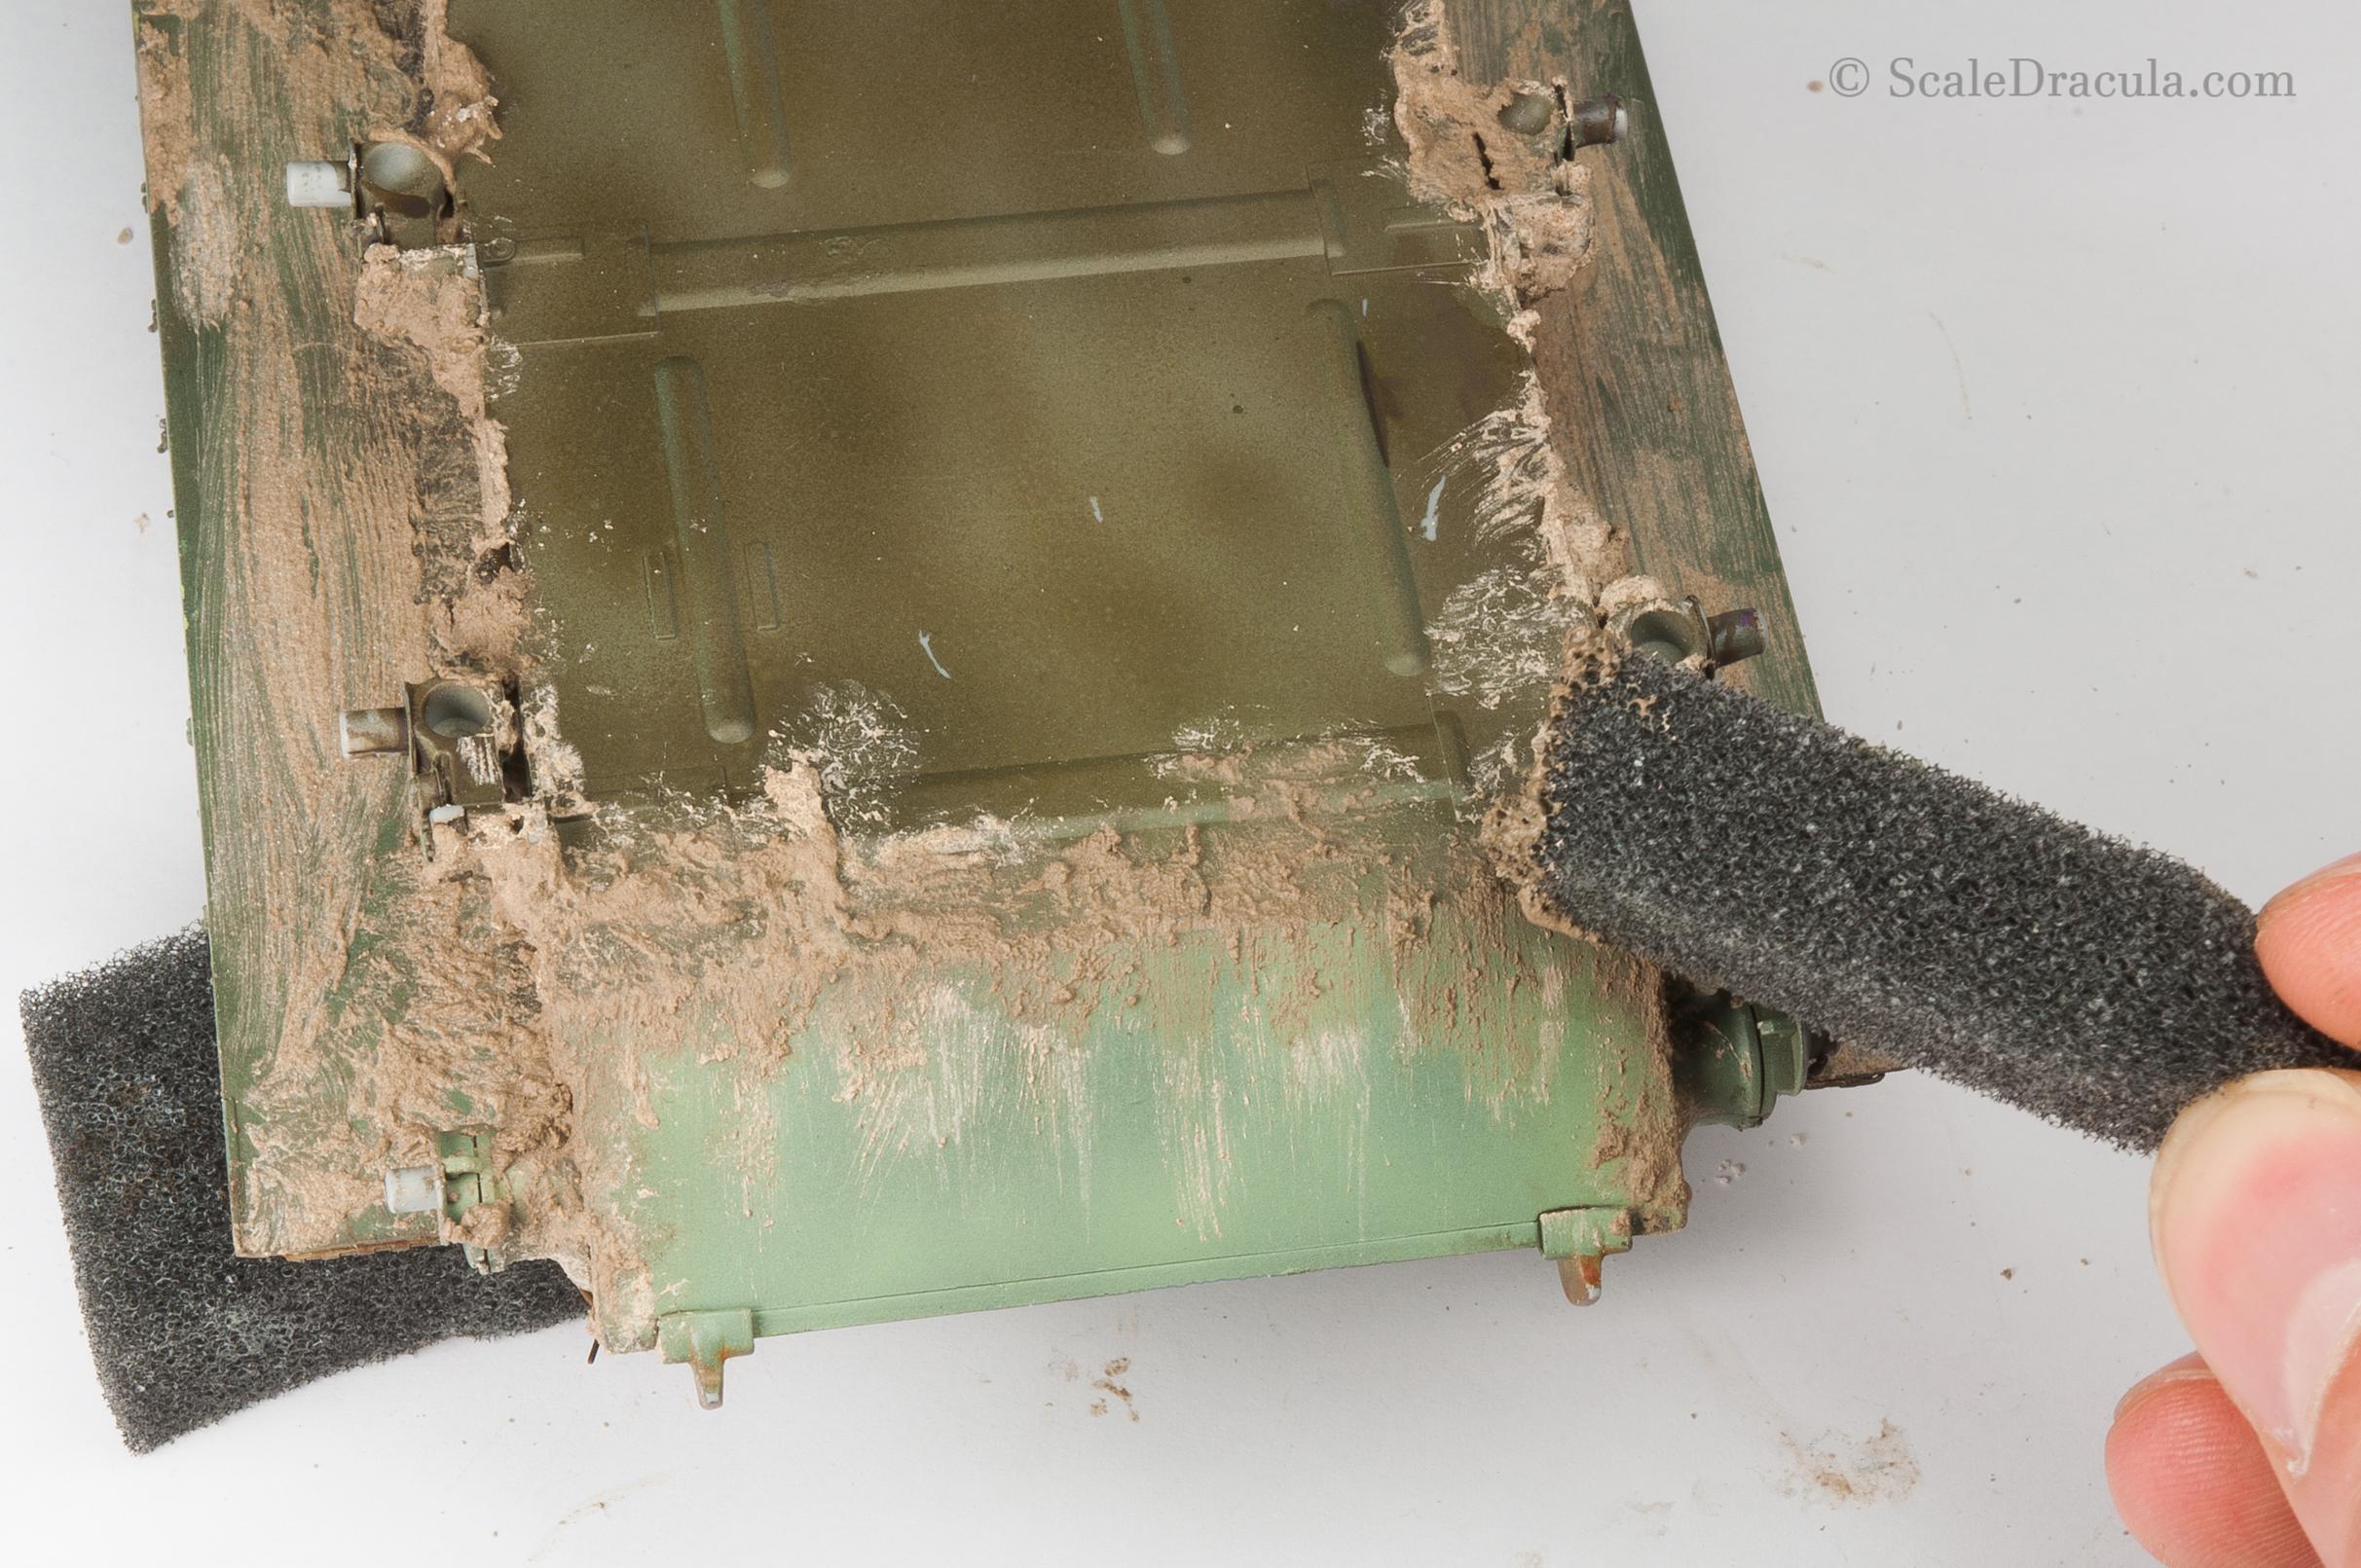 Mud textured with a sponge, ZSU-57 by TAKOM